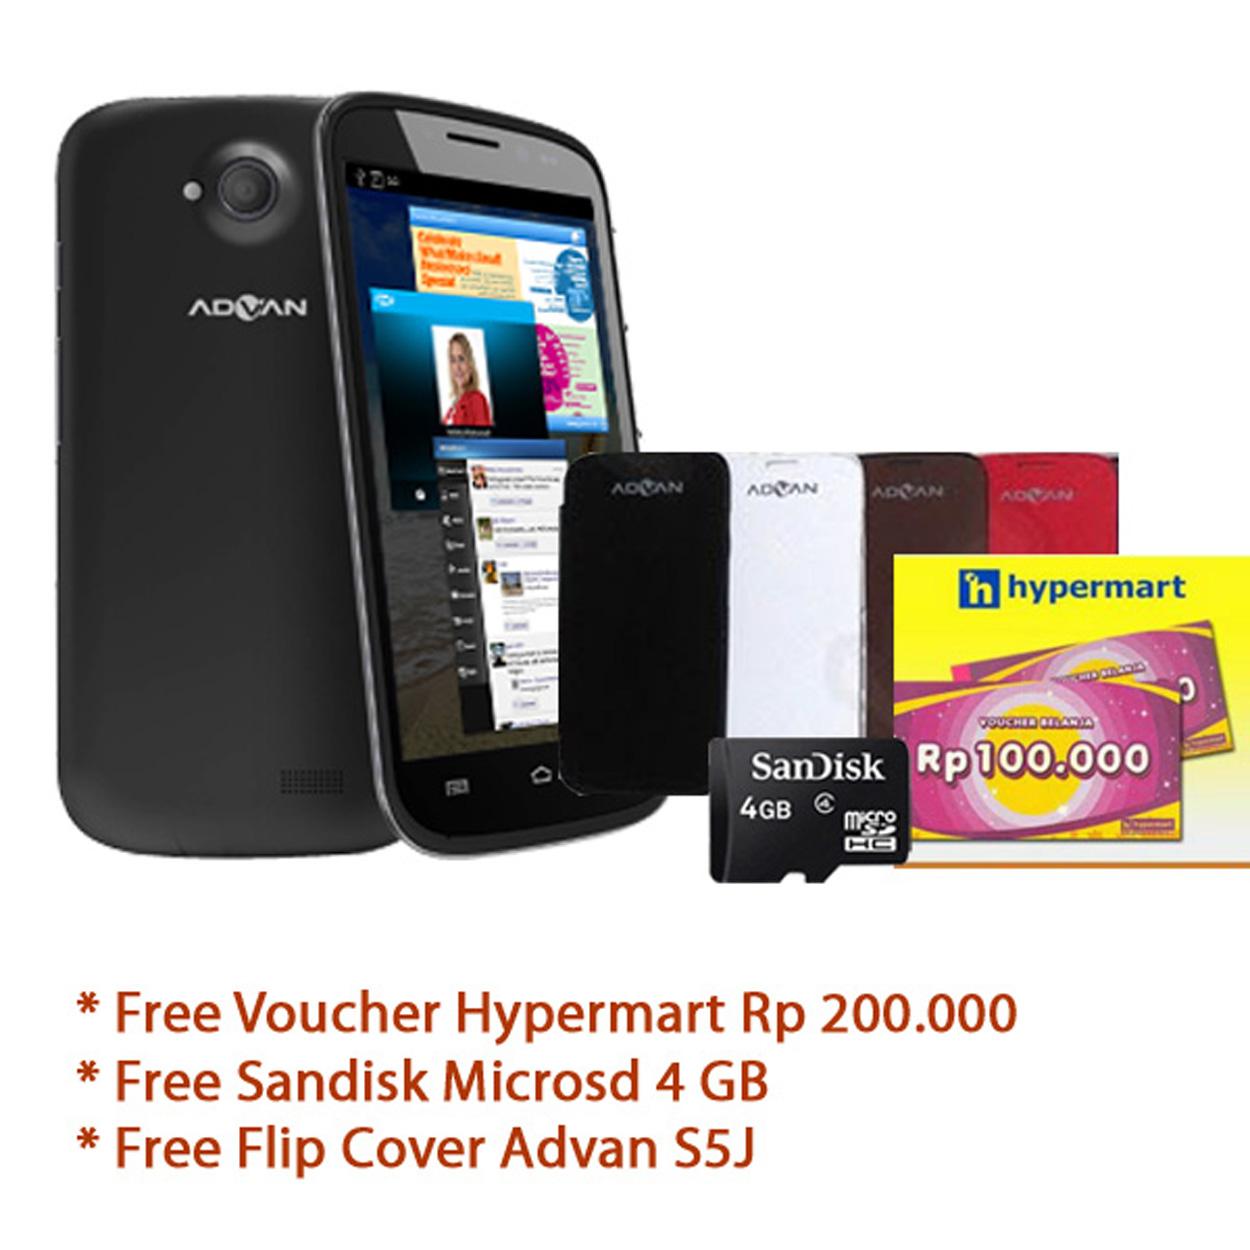 Jual Advan Vandroid S5j Black Free Voucher Rp 200rb Microsd 4gb Flip Smartphone Quadcore Cover Paziashop Tokopedia